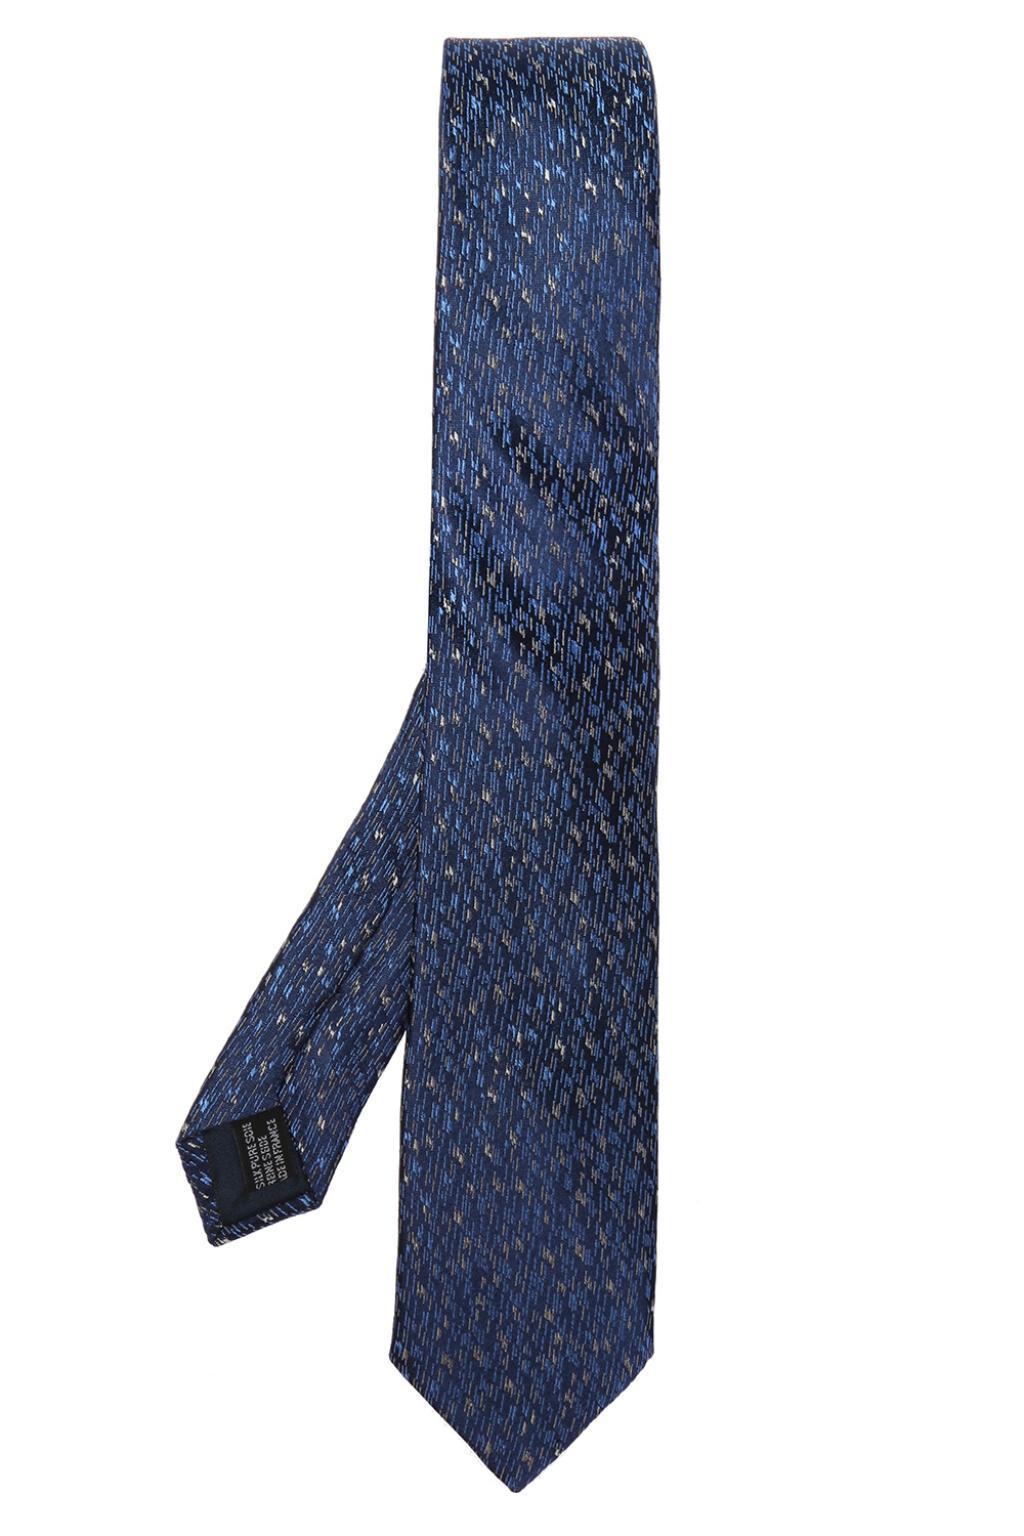 Cravate À Motifs - Bleu Lanvin ZMXC4rIt